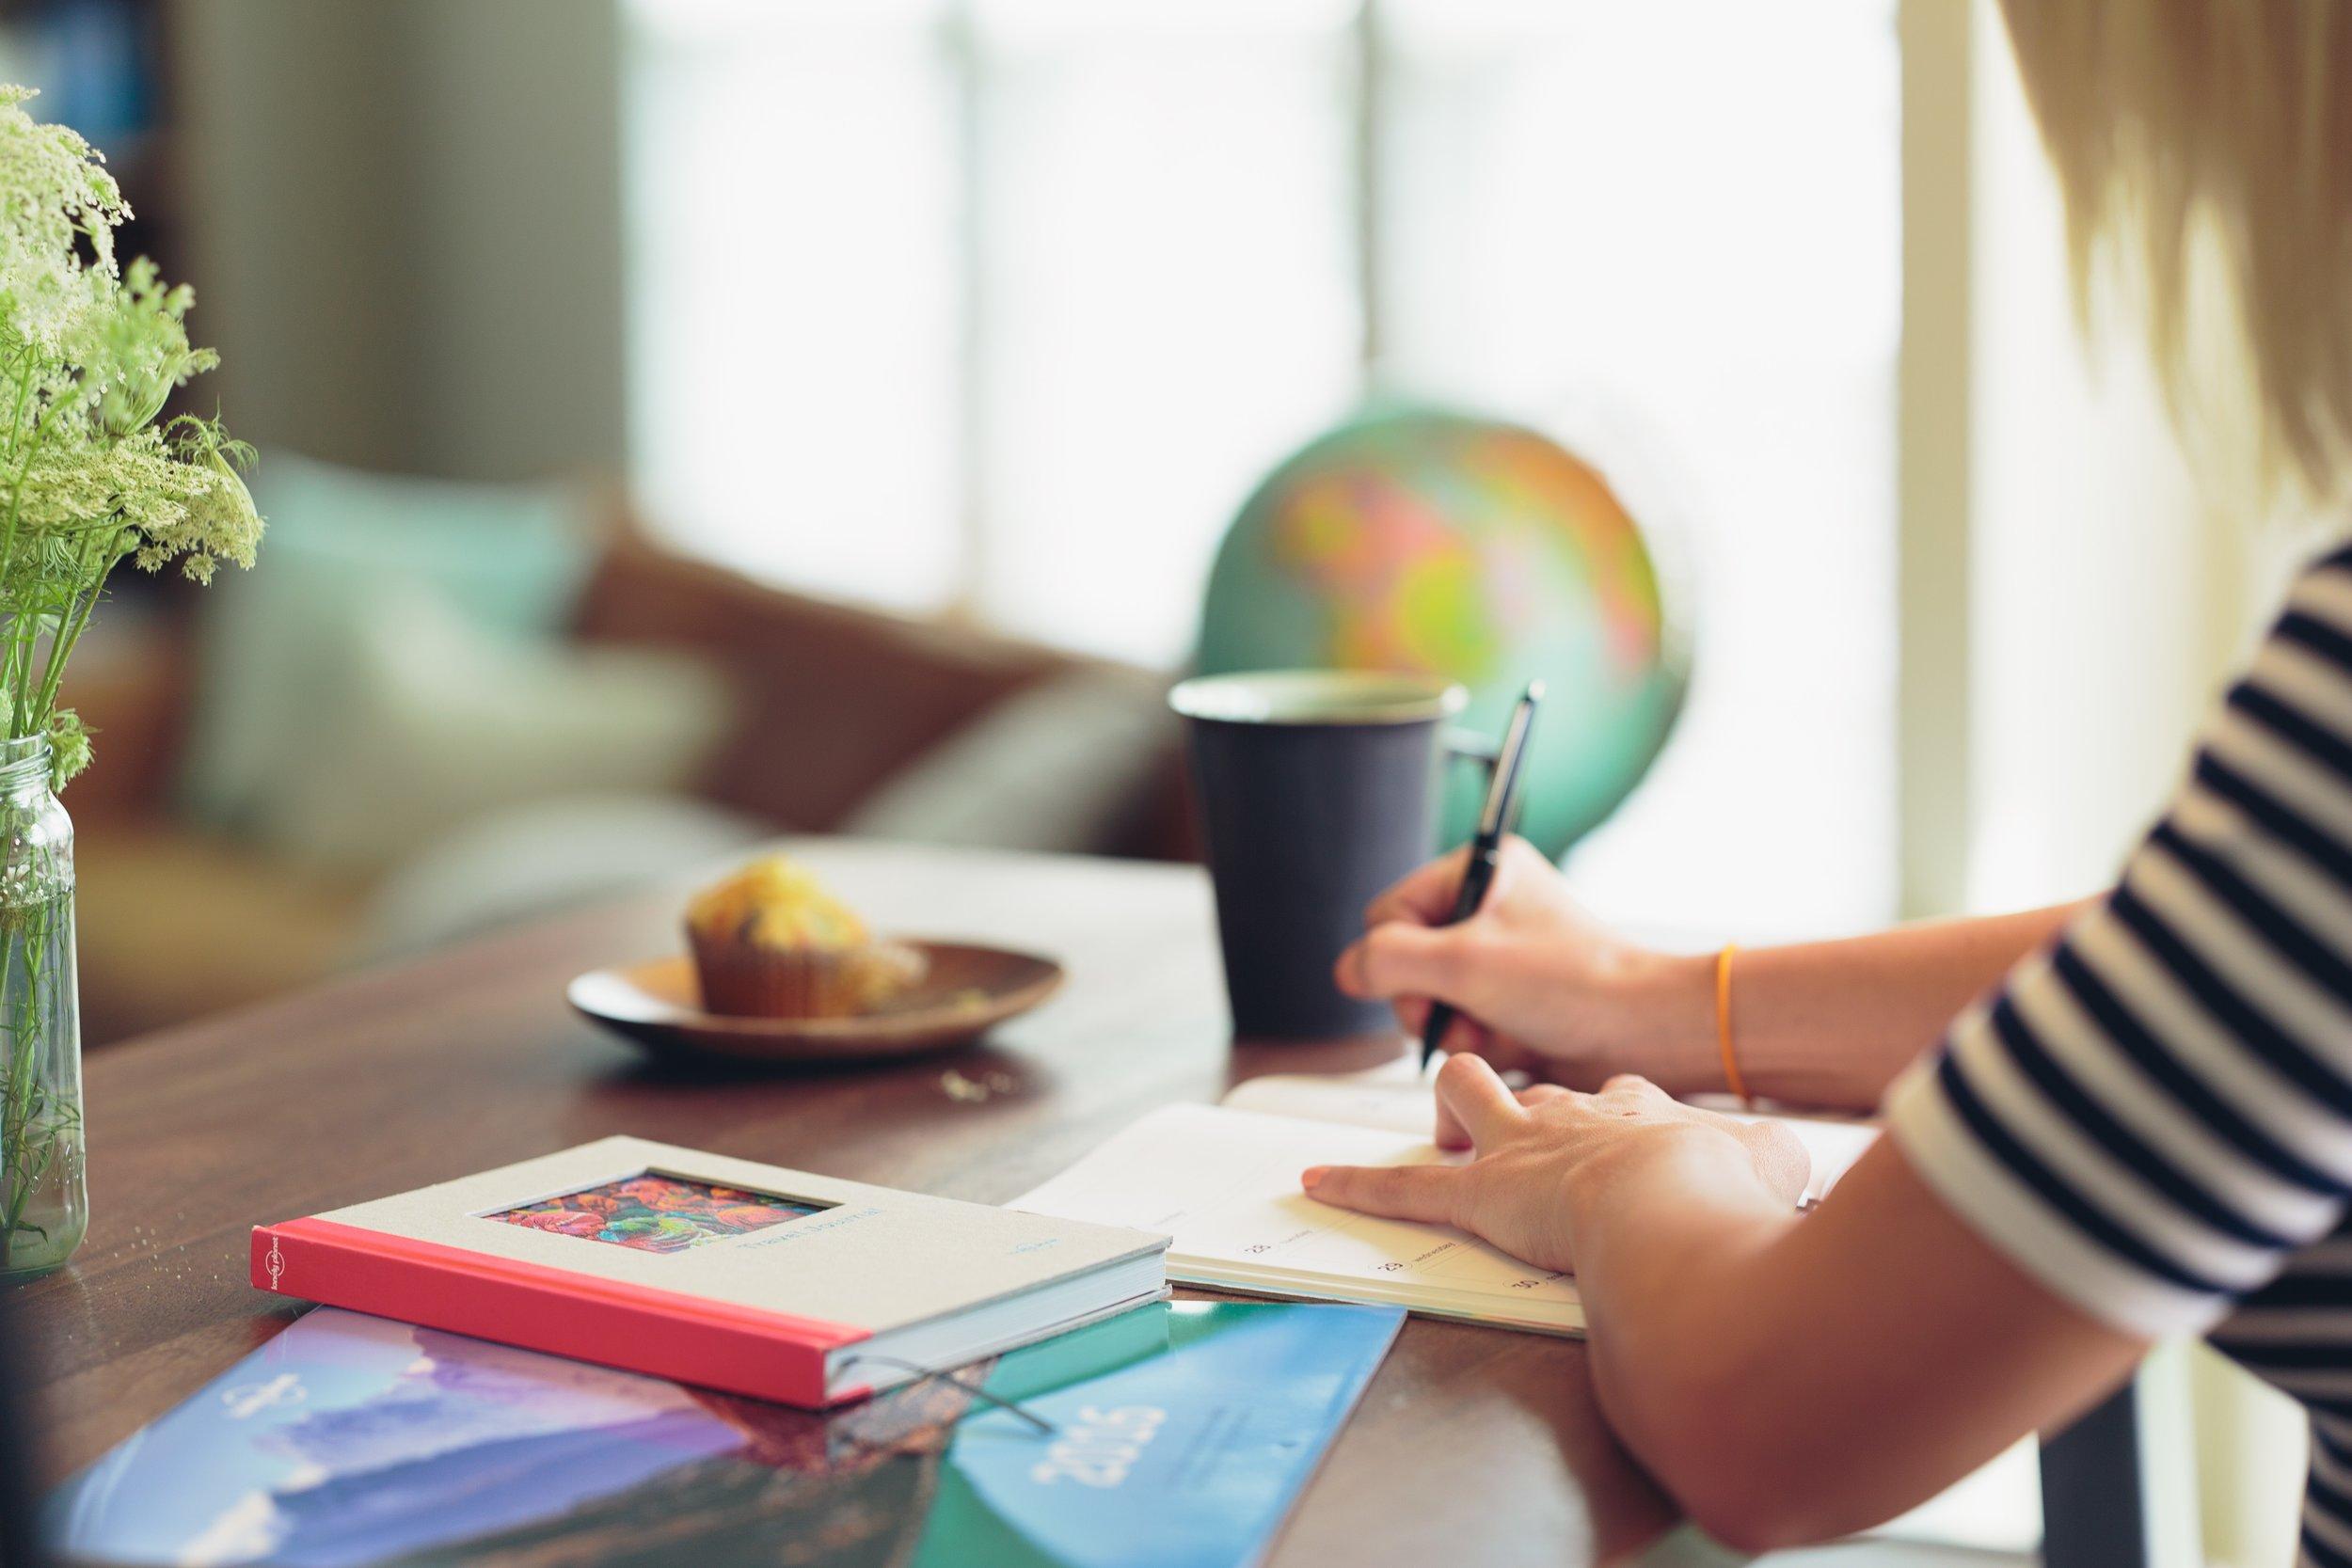 travel-journal-for-organizing-memorabilia